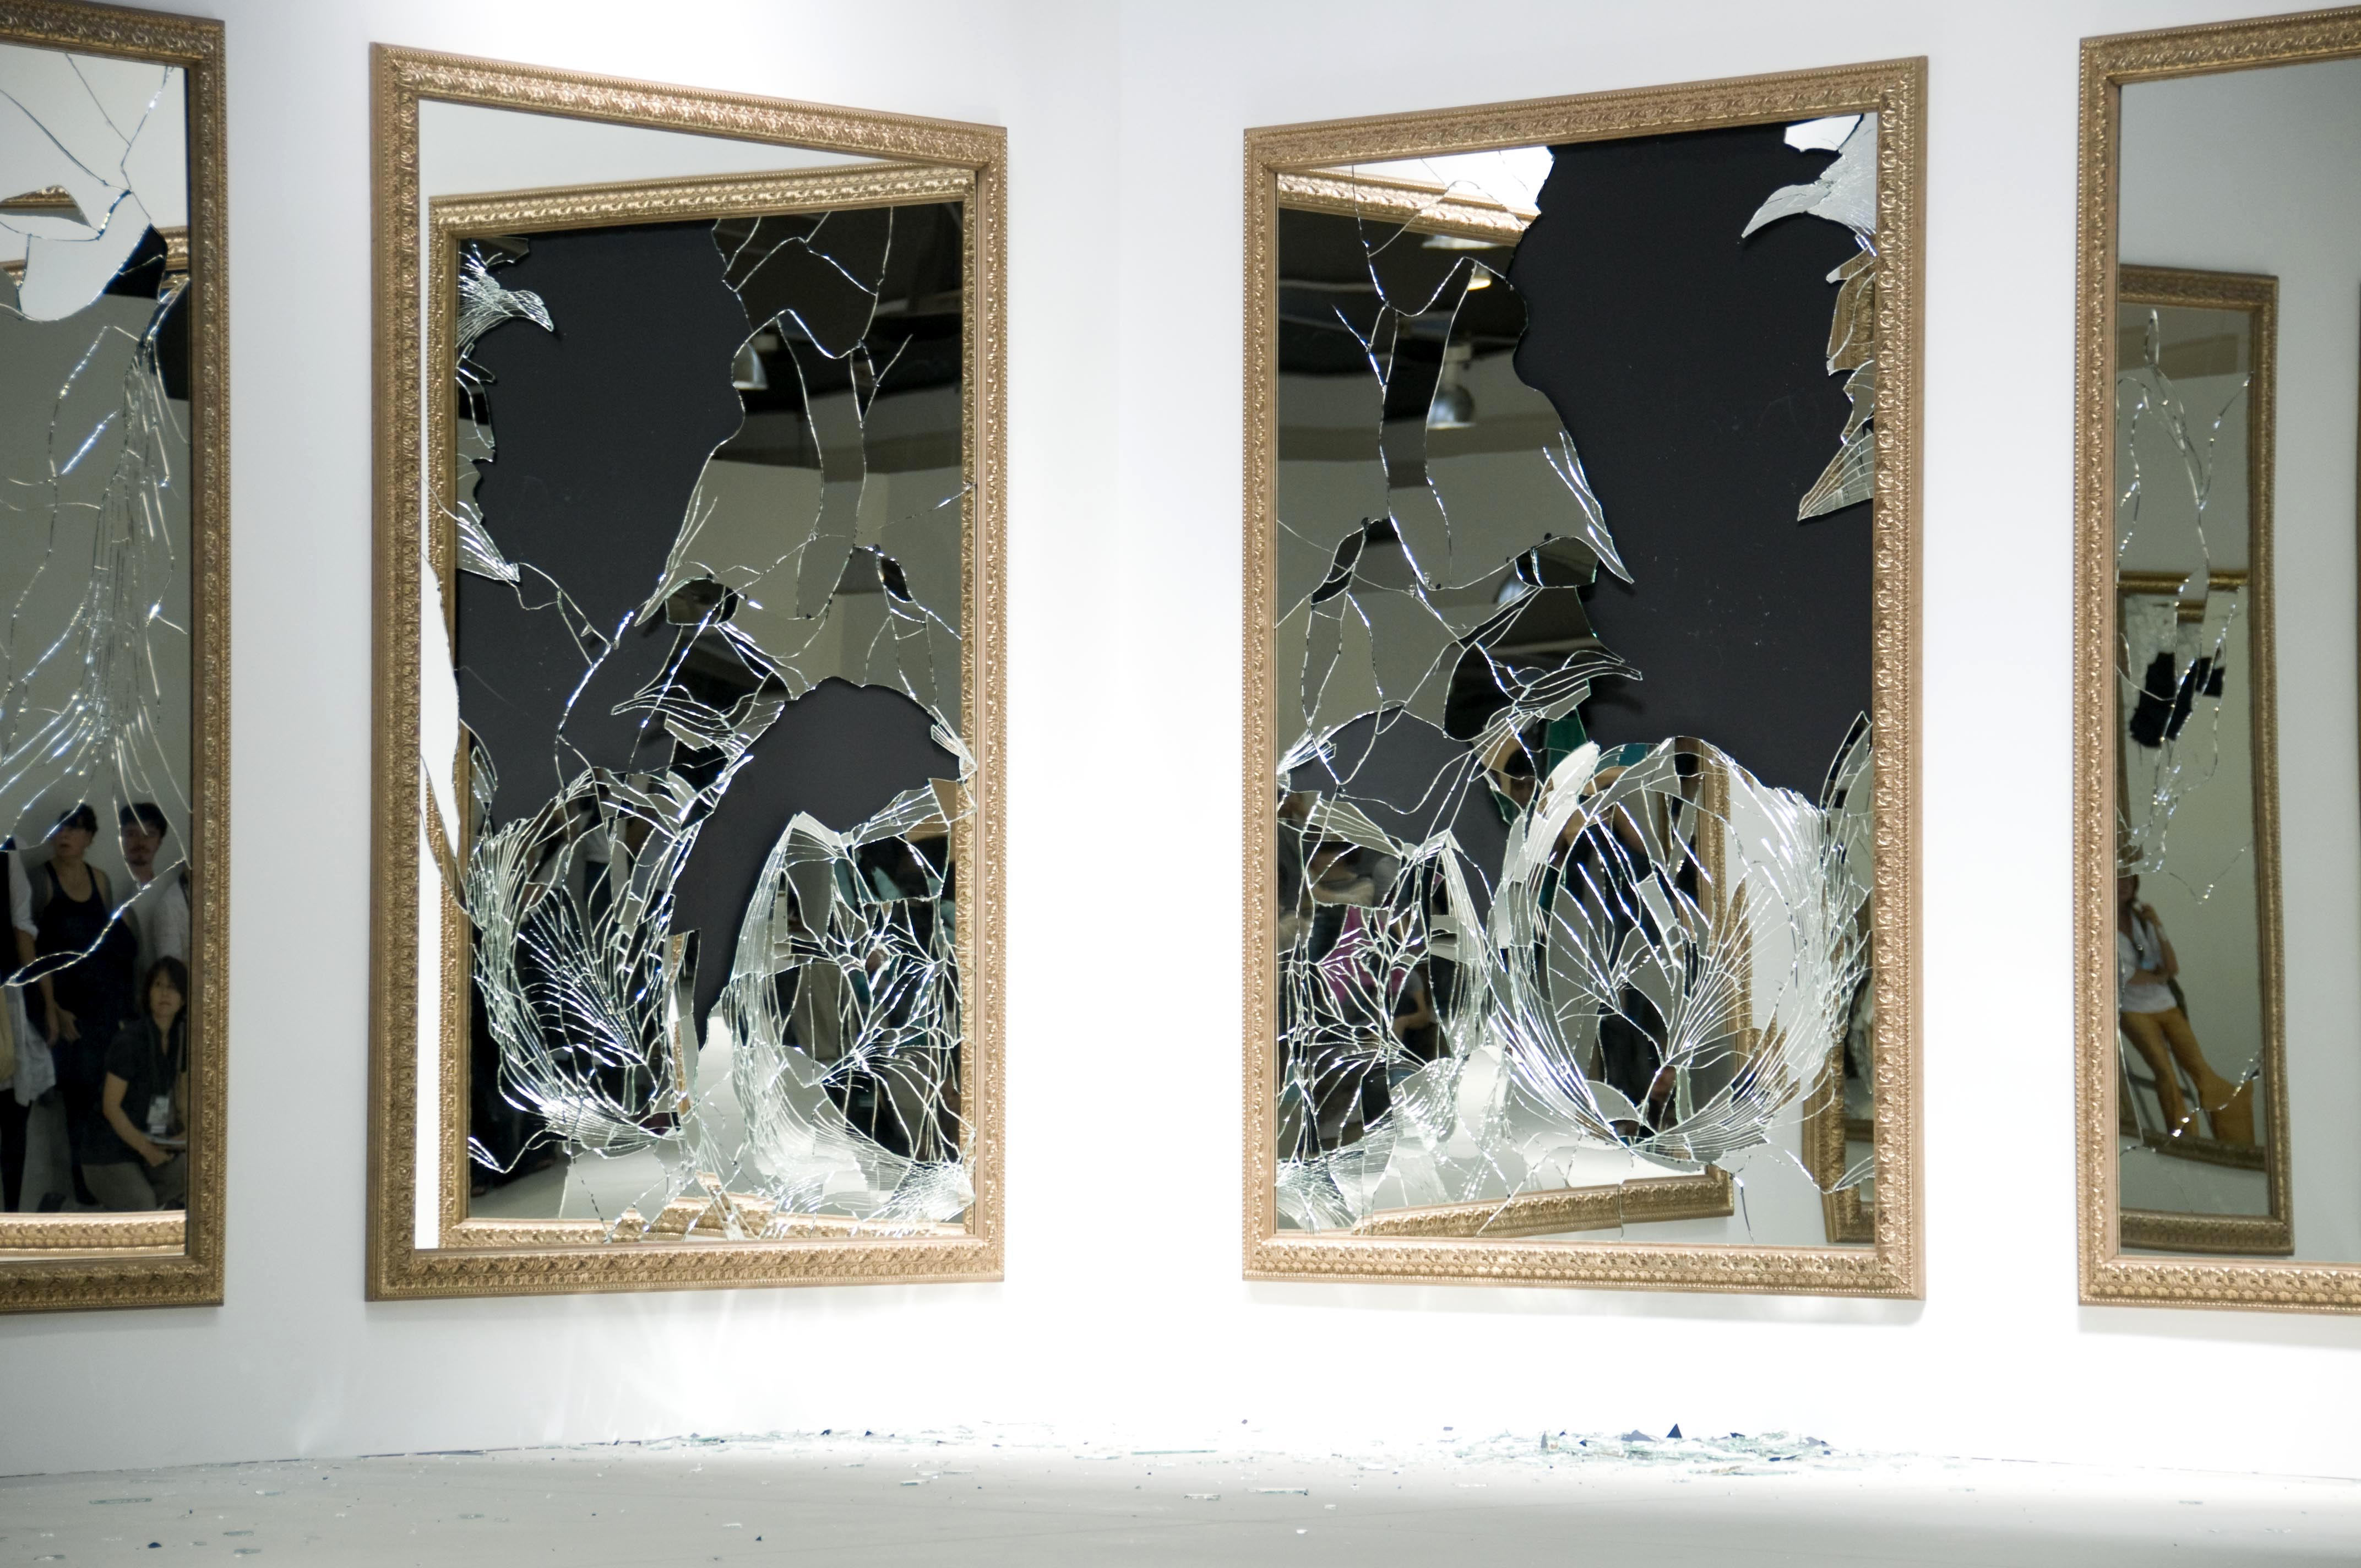 Michelangelo Pistoletto per la Biennale 52